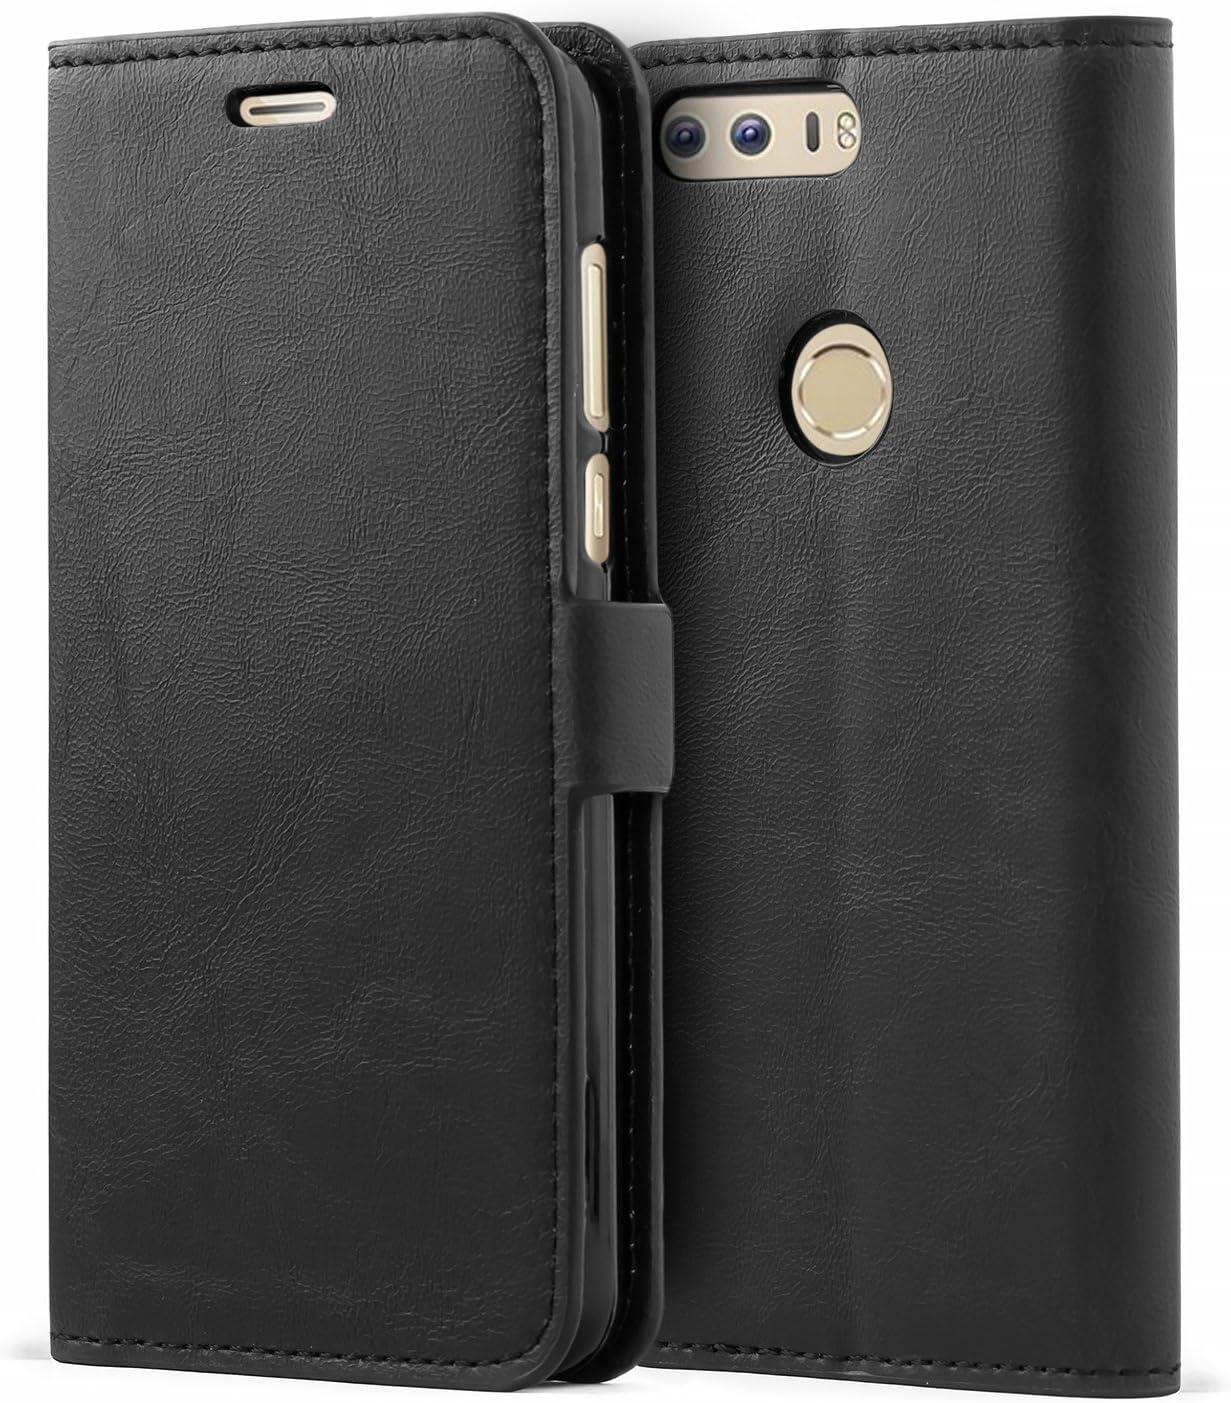 Mulbess Funda Honor 8 [Libro Caso Cubierta] [Bookstyle de Billetera Cuero] con Tapa Magnética Carcasa para Huawei Honor 8 Case, Negro